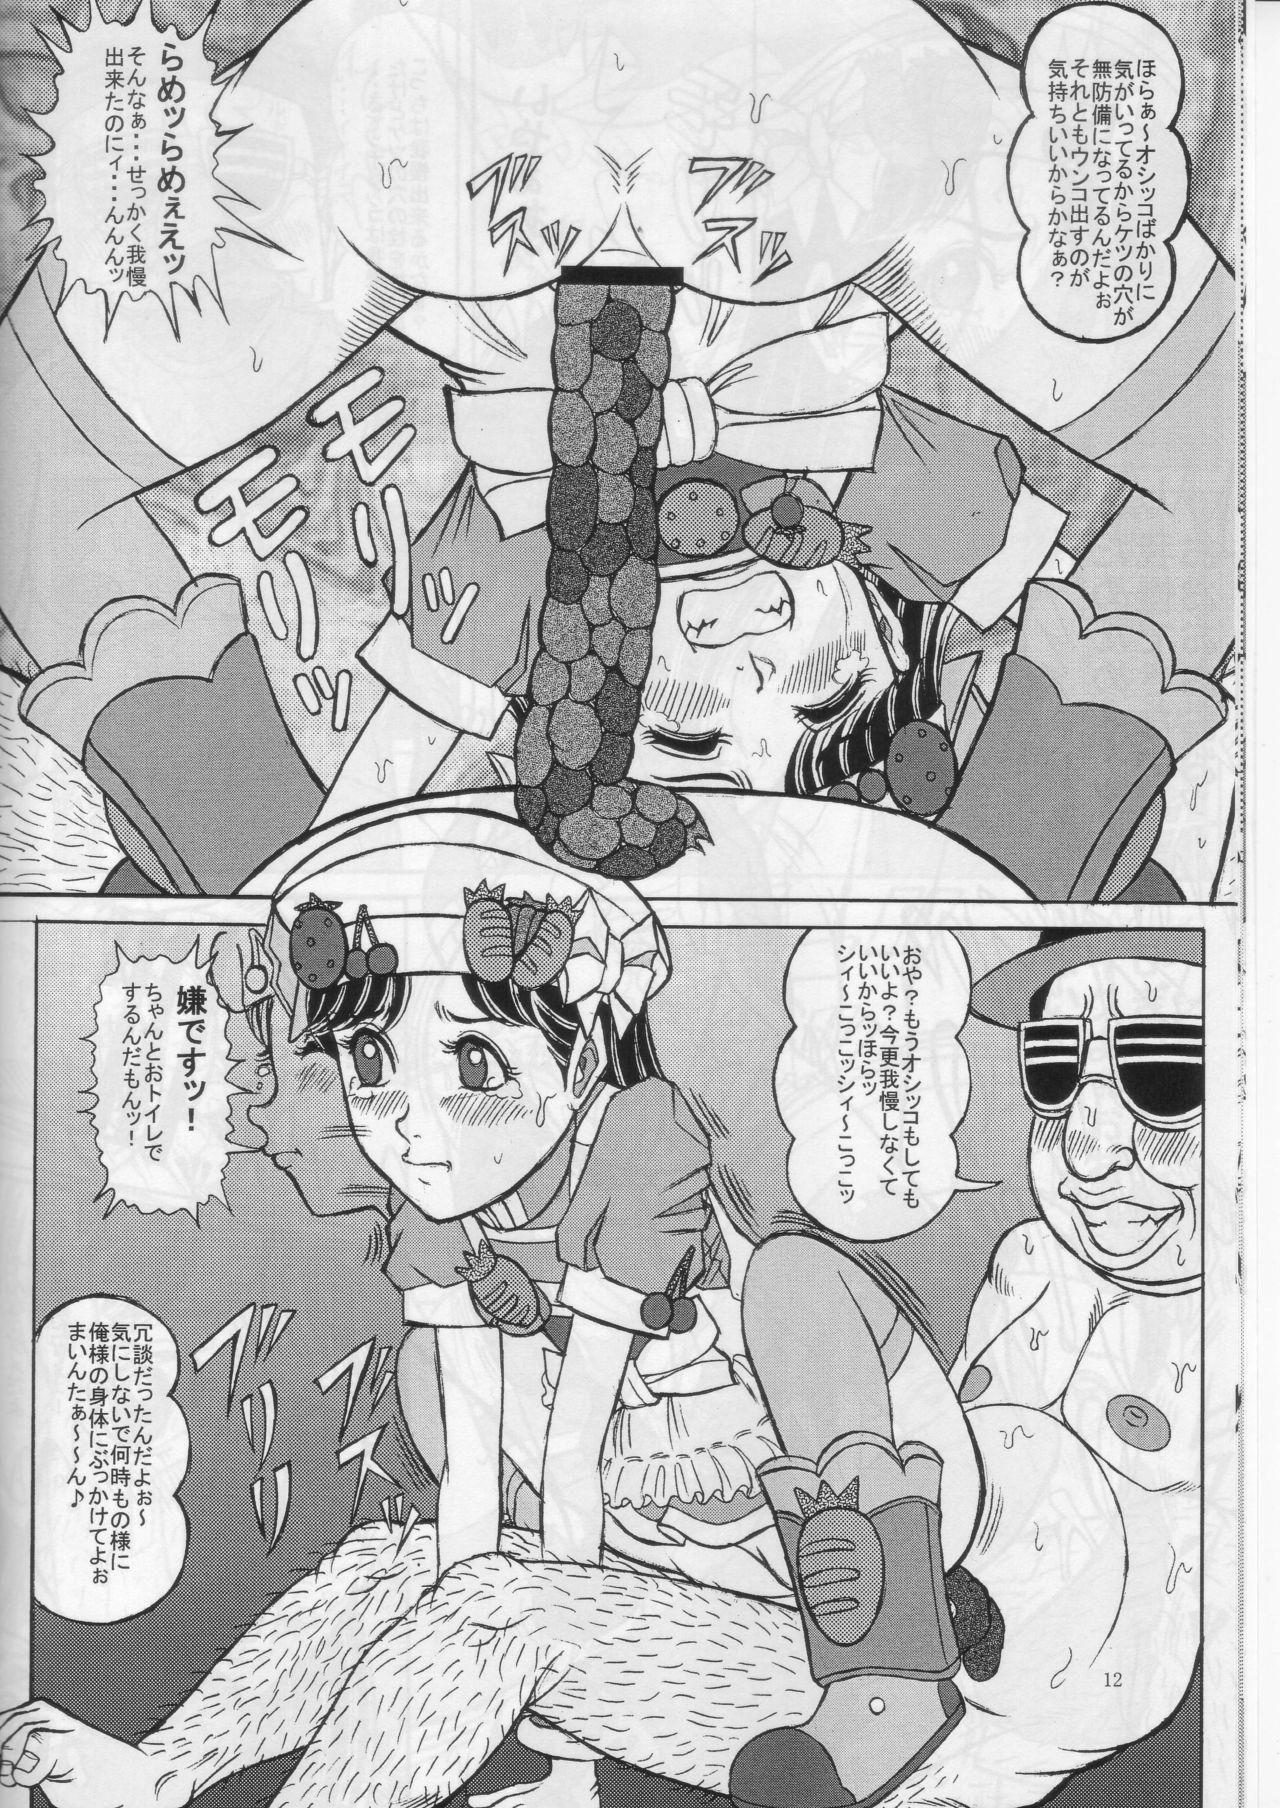 Minna de Yokumite Ara★Domo♪ Kaiseiban 10